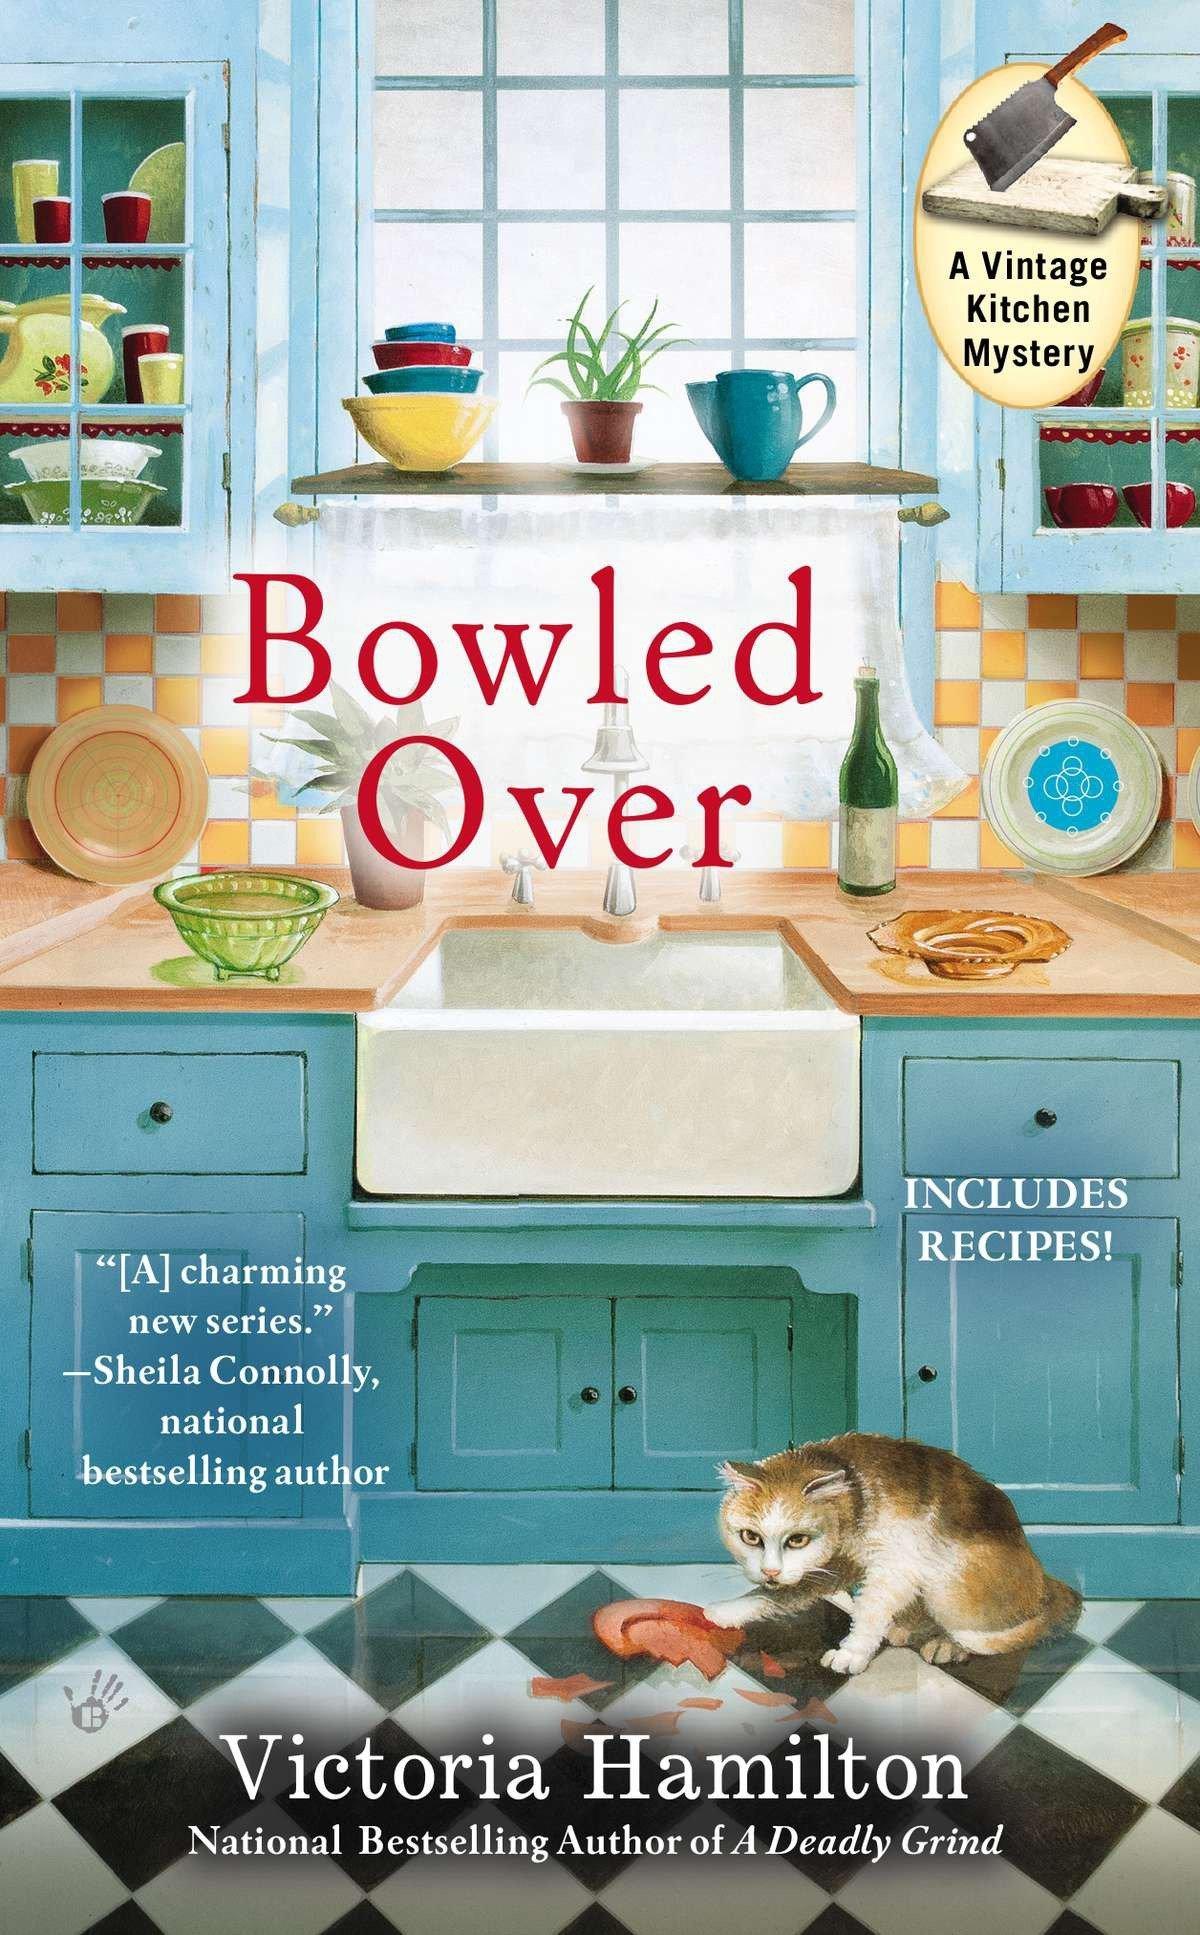 Bowled Over (Vintage Kitchen Mysteries): Amazon.co.uk: Victoria Hamilton:  9780425251928: Books